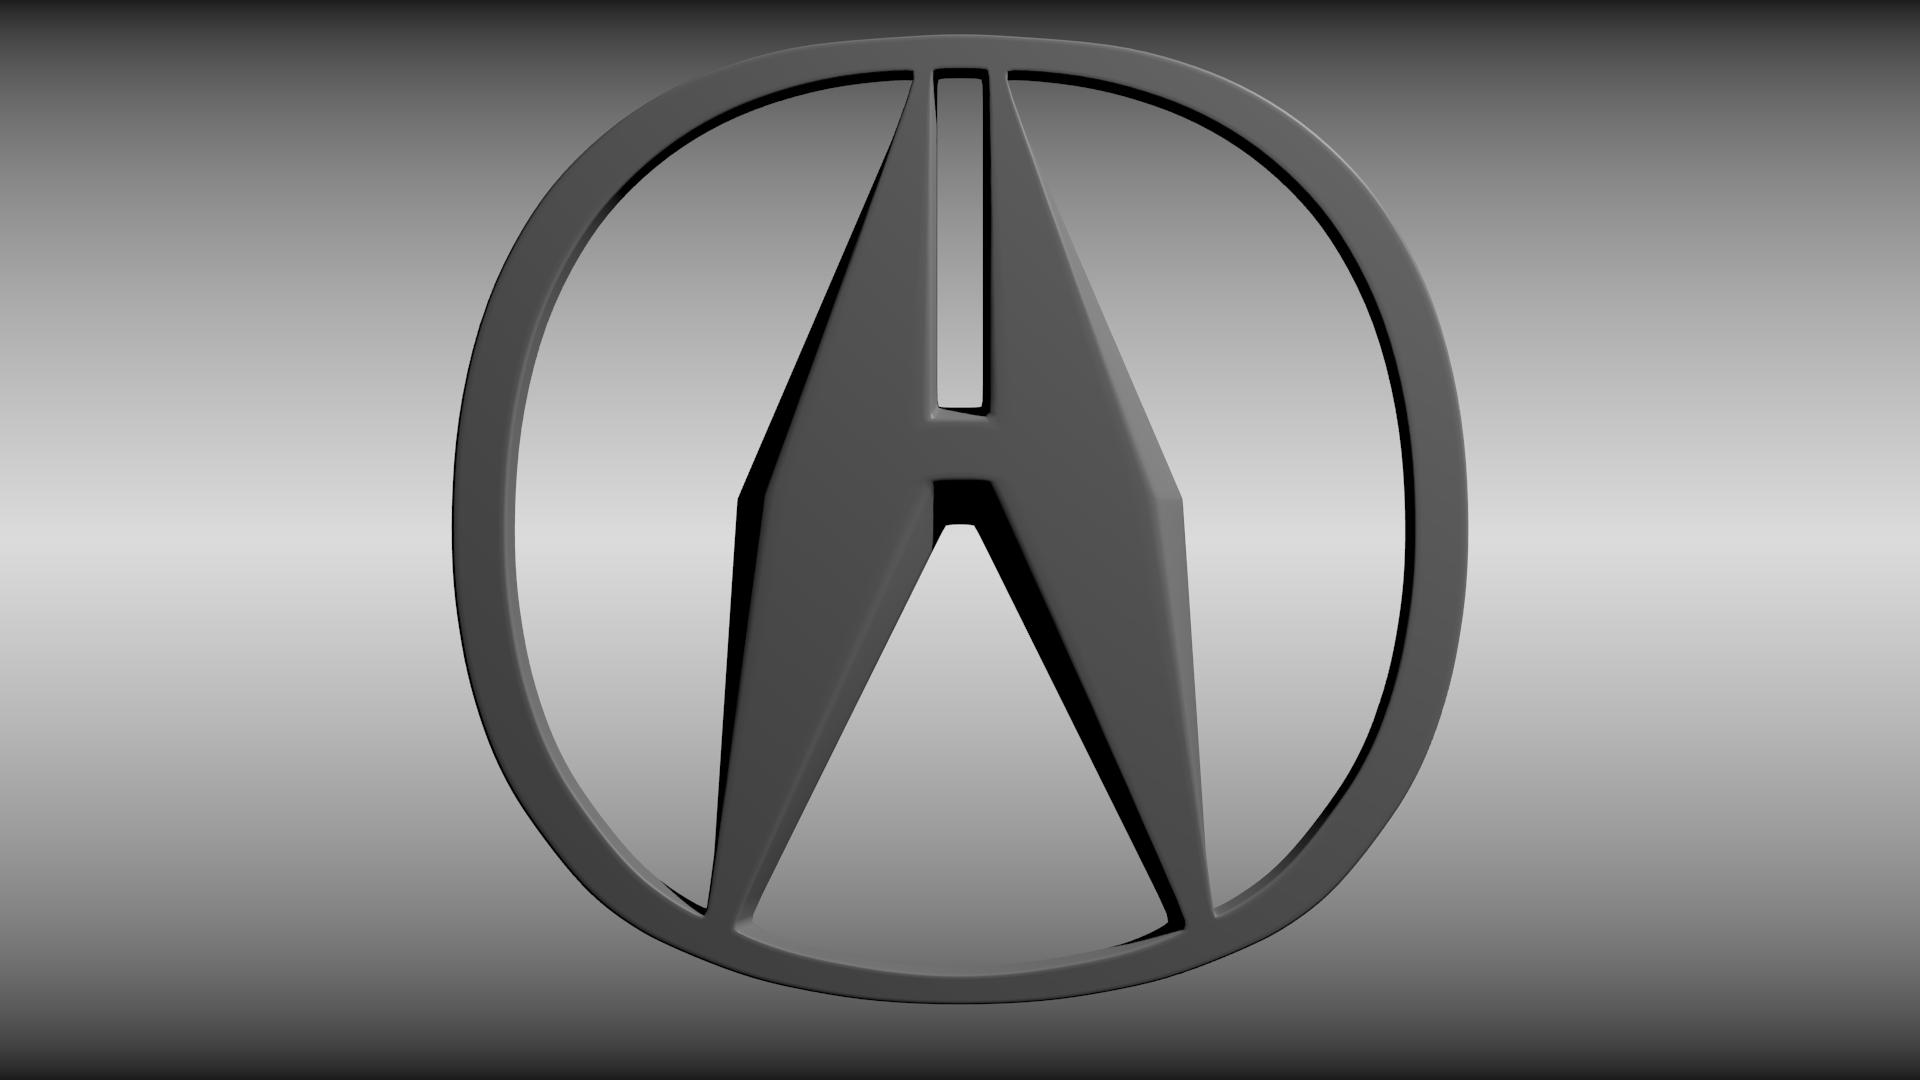 acura logo desktop wallpaper 59007